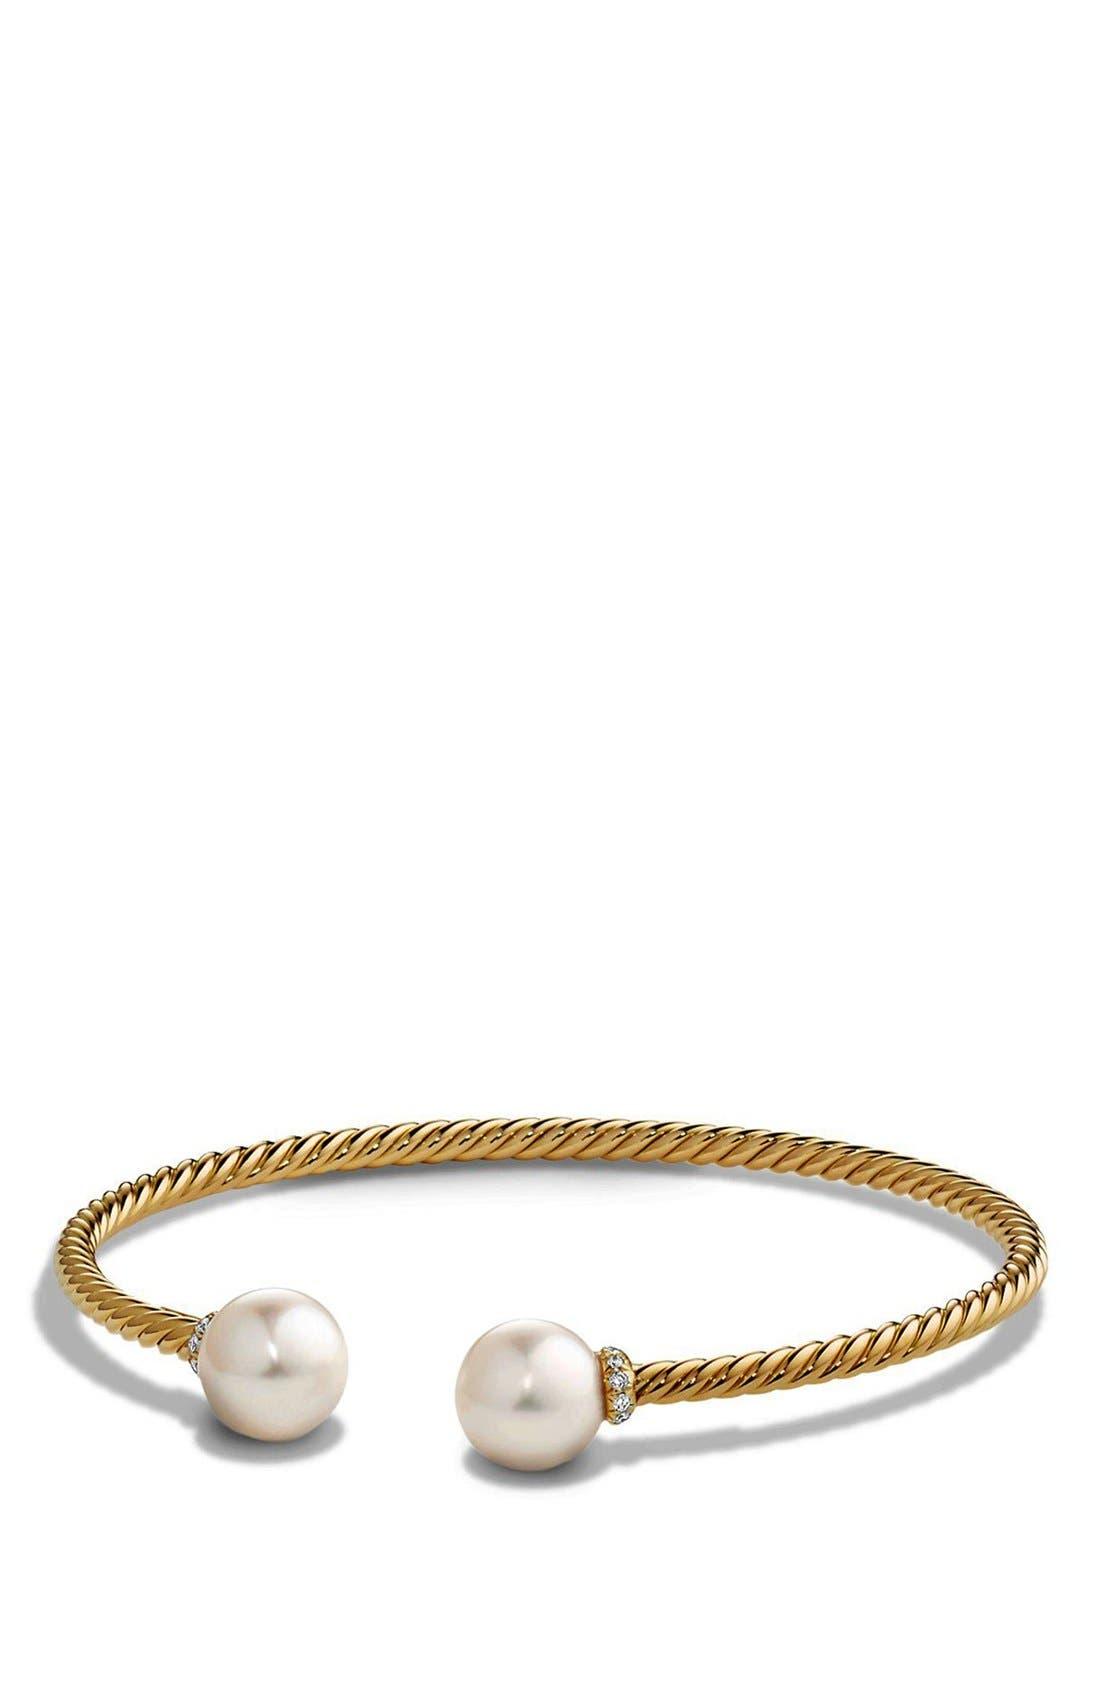 Alternate Image 1 Selected - David Yurman 'Solari' Bead Bracelet with Diamonds and Pearls in 18K Gold